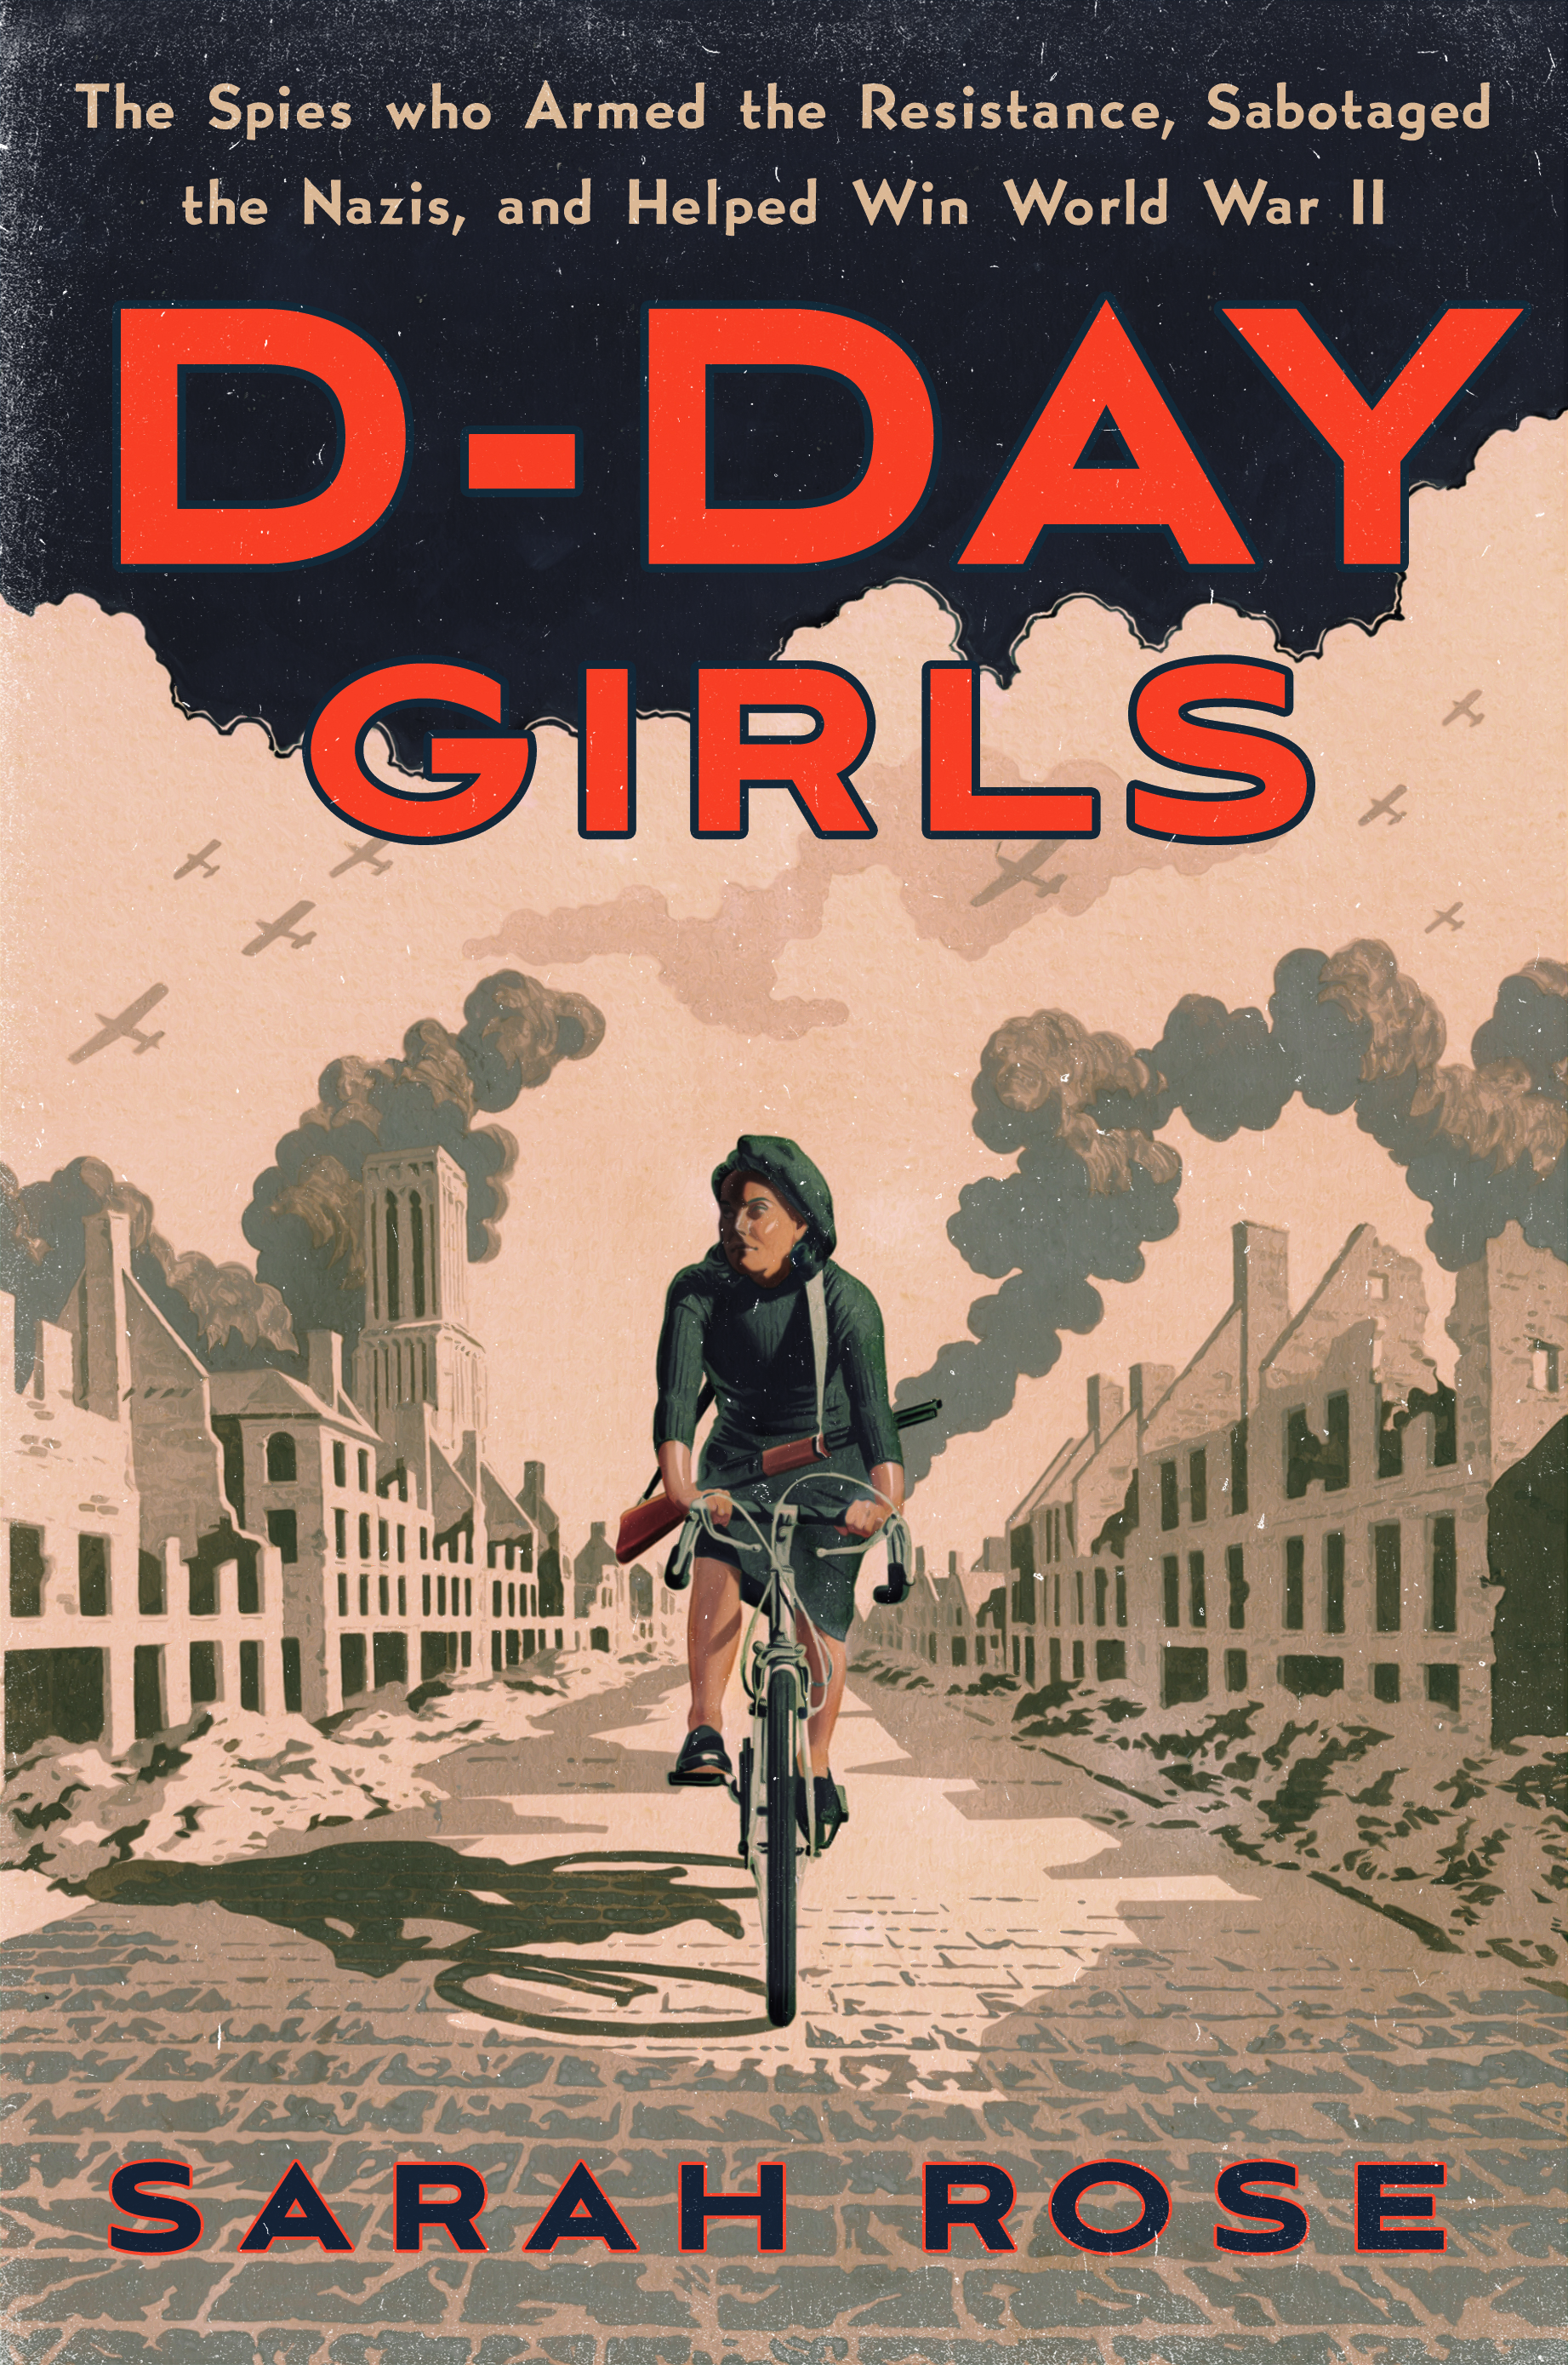 D-Day Girls FINAL new copy Trim - COVER.jpg